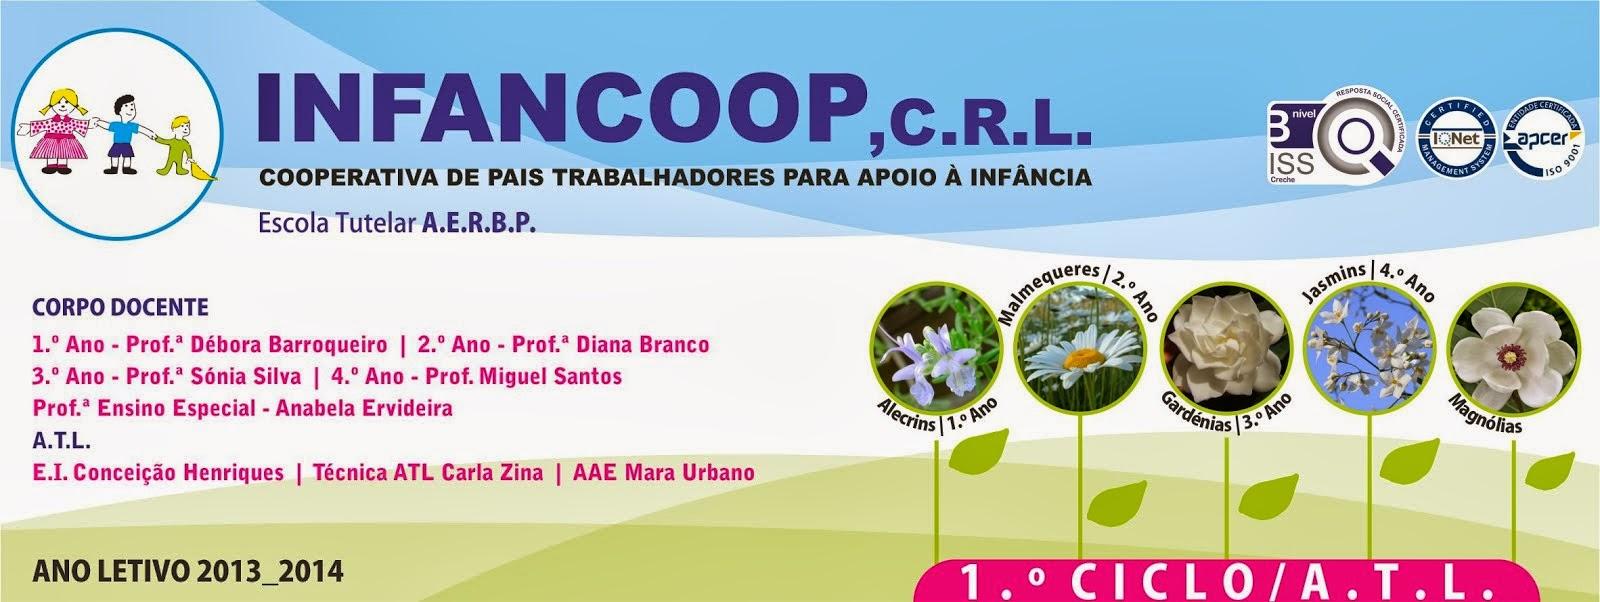 1.º Ciclo na Infancoop